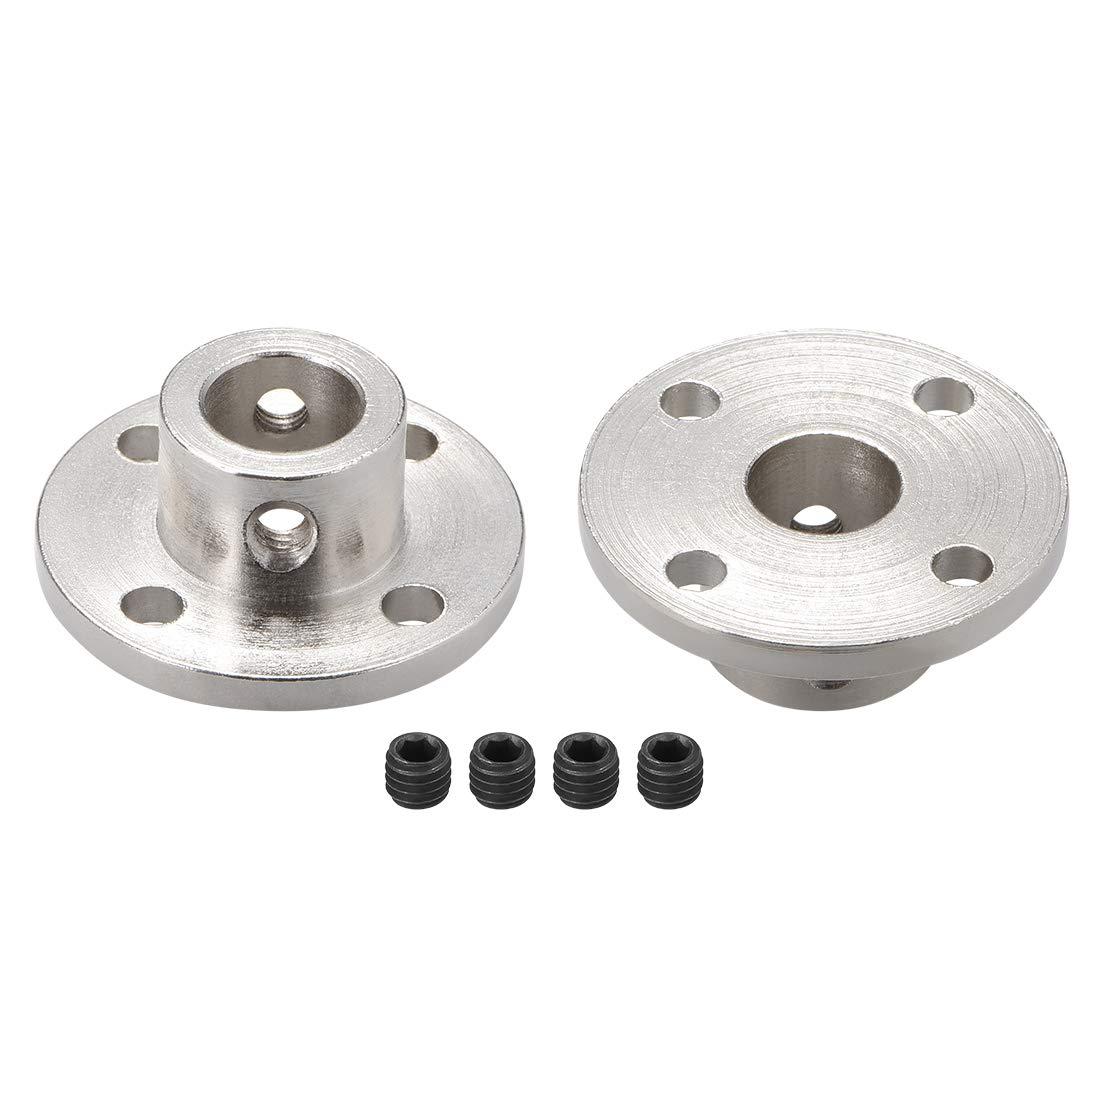 uxcell 6mm Inner Dia H15D15 Rigid Flange Coupling Motor Guide Shaft Coupler Motor Connector for DIY Parts